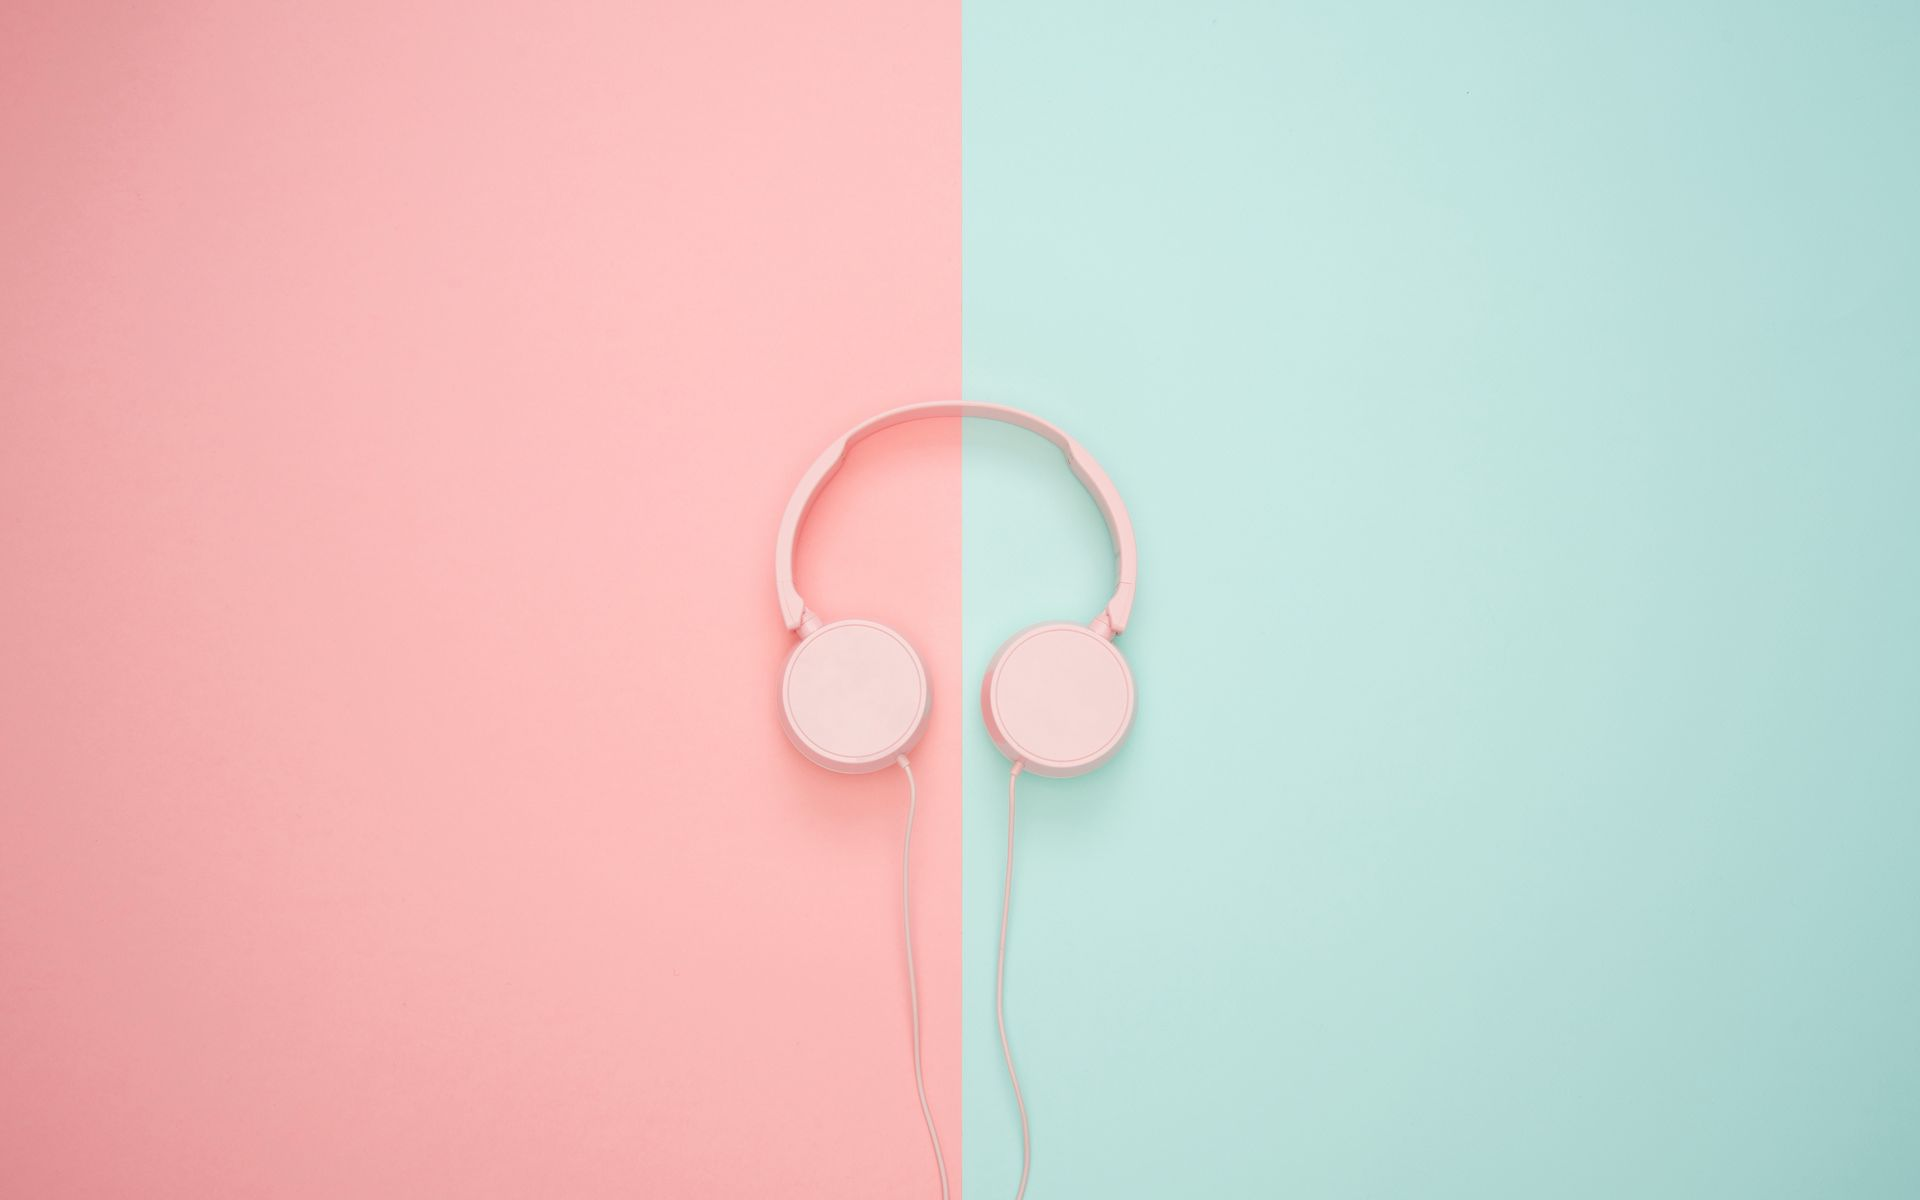 1920x1200 Wallpaper headphones, minimalism, pink, pastel